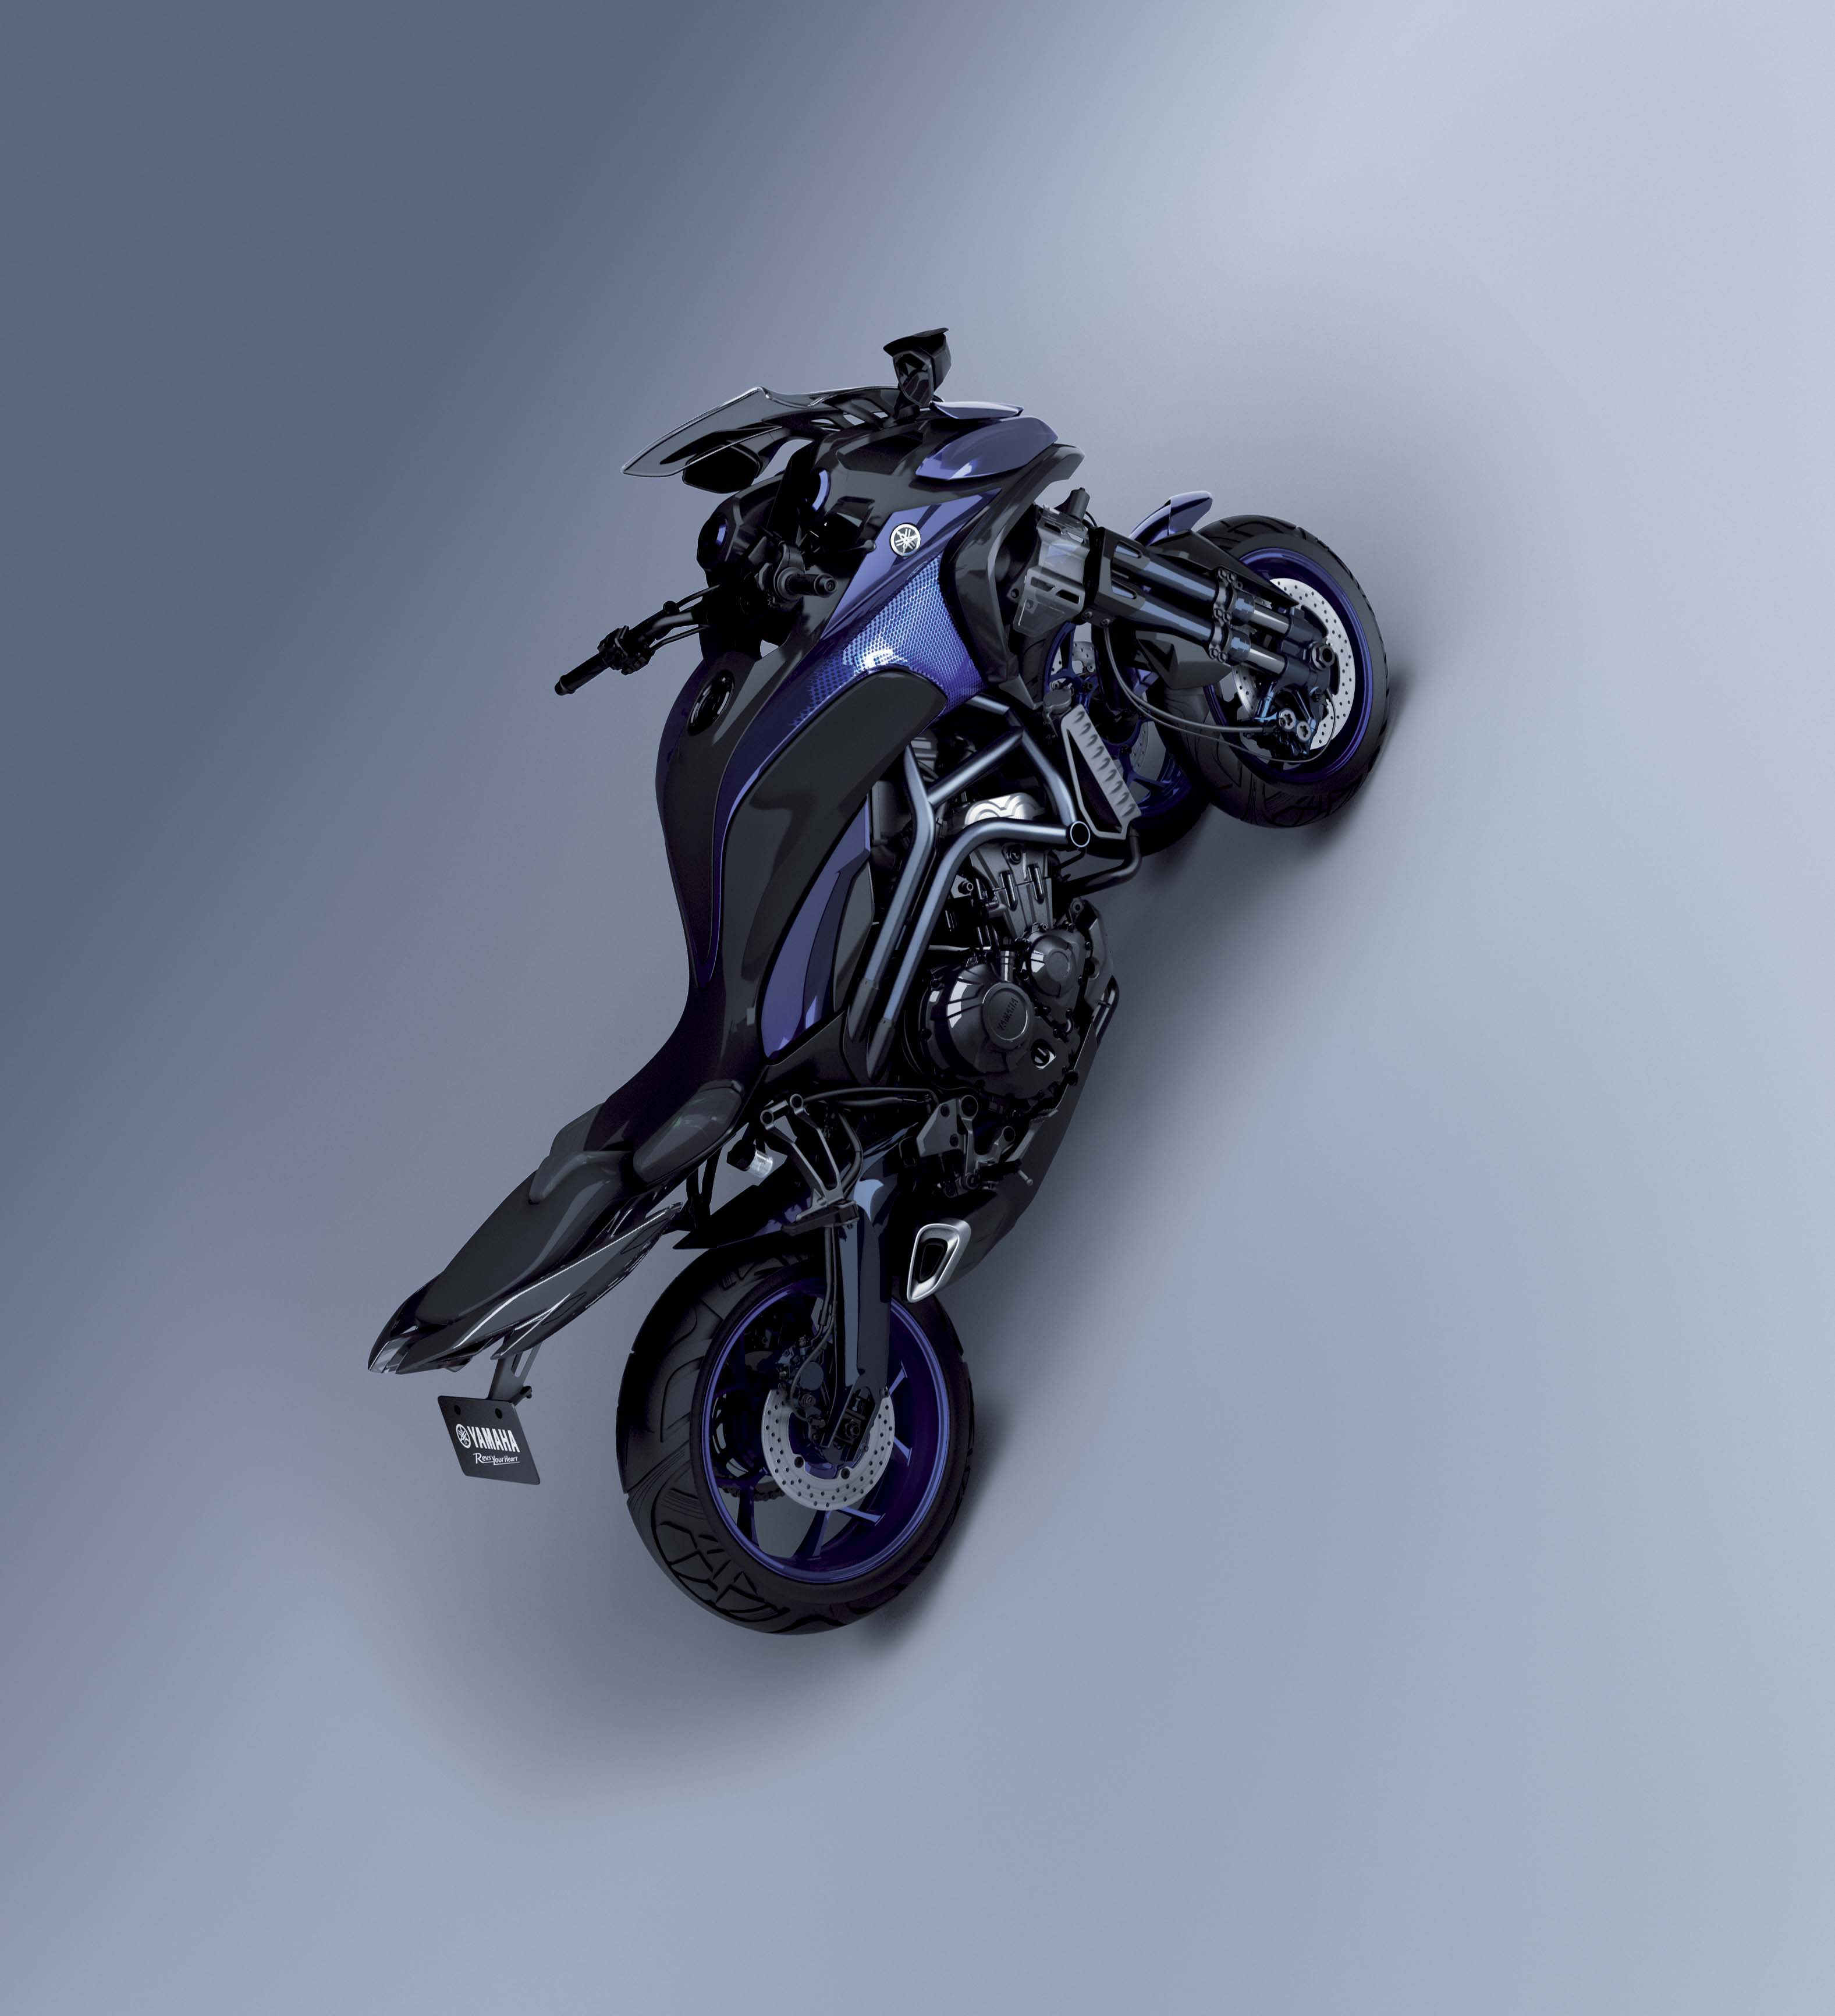 Yamha-MWT-09-leaning-trike-concept-01